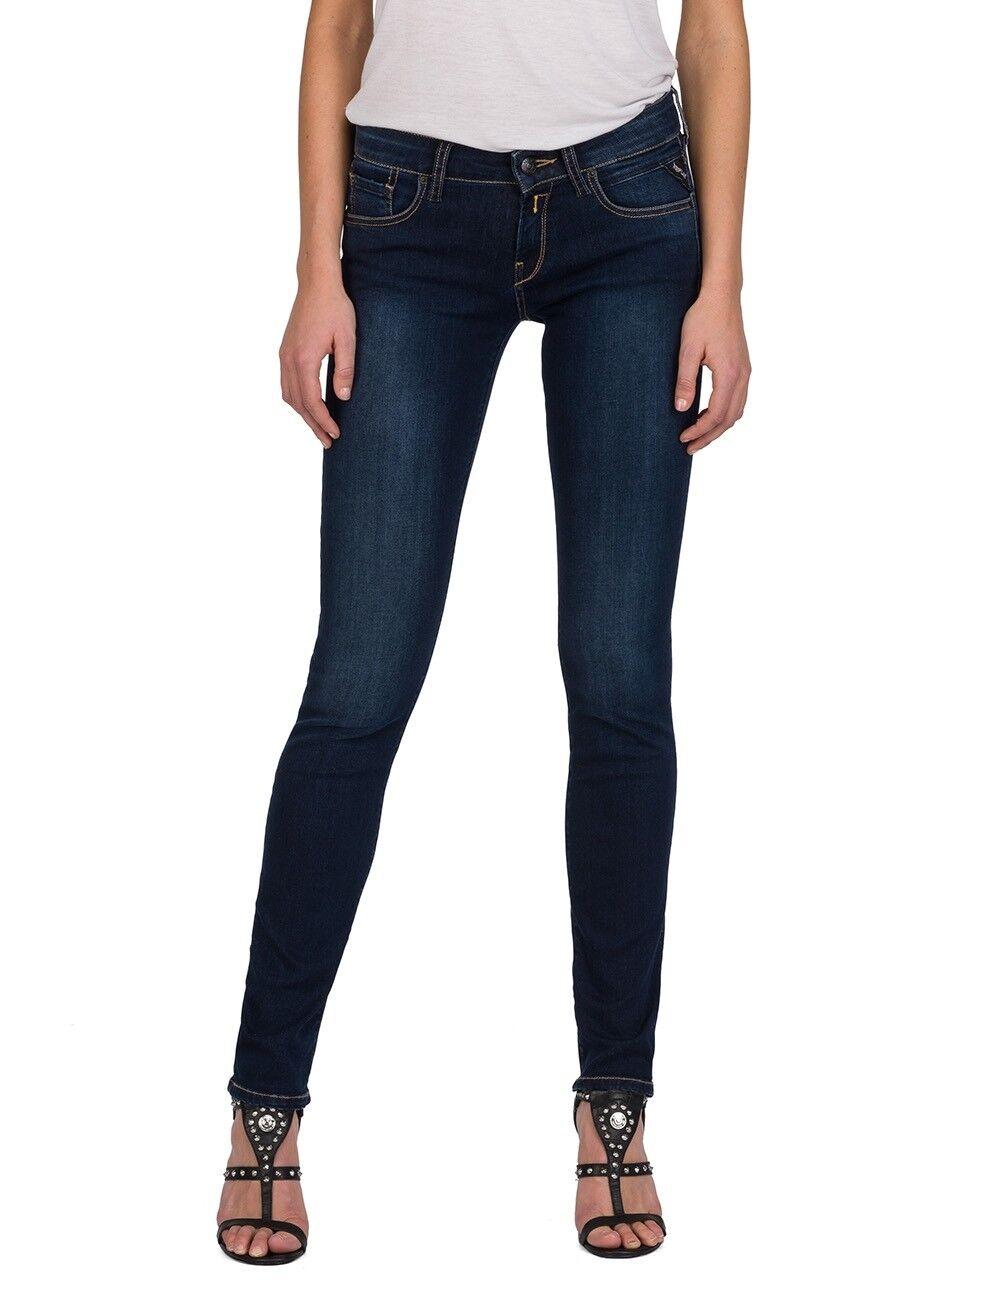 Replay Damen Jeans Vicki - Straight Fit - Blau - Medium Blau